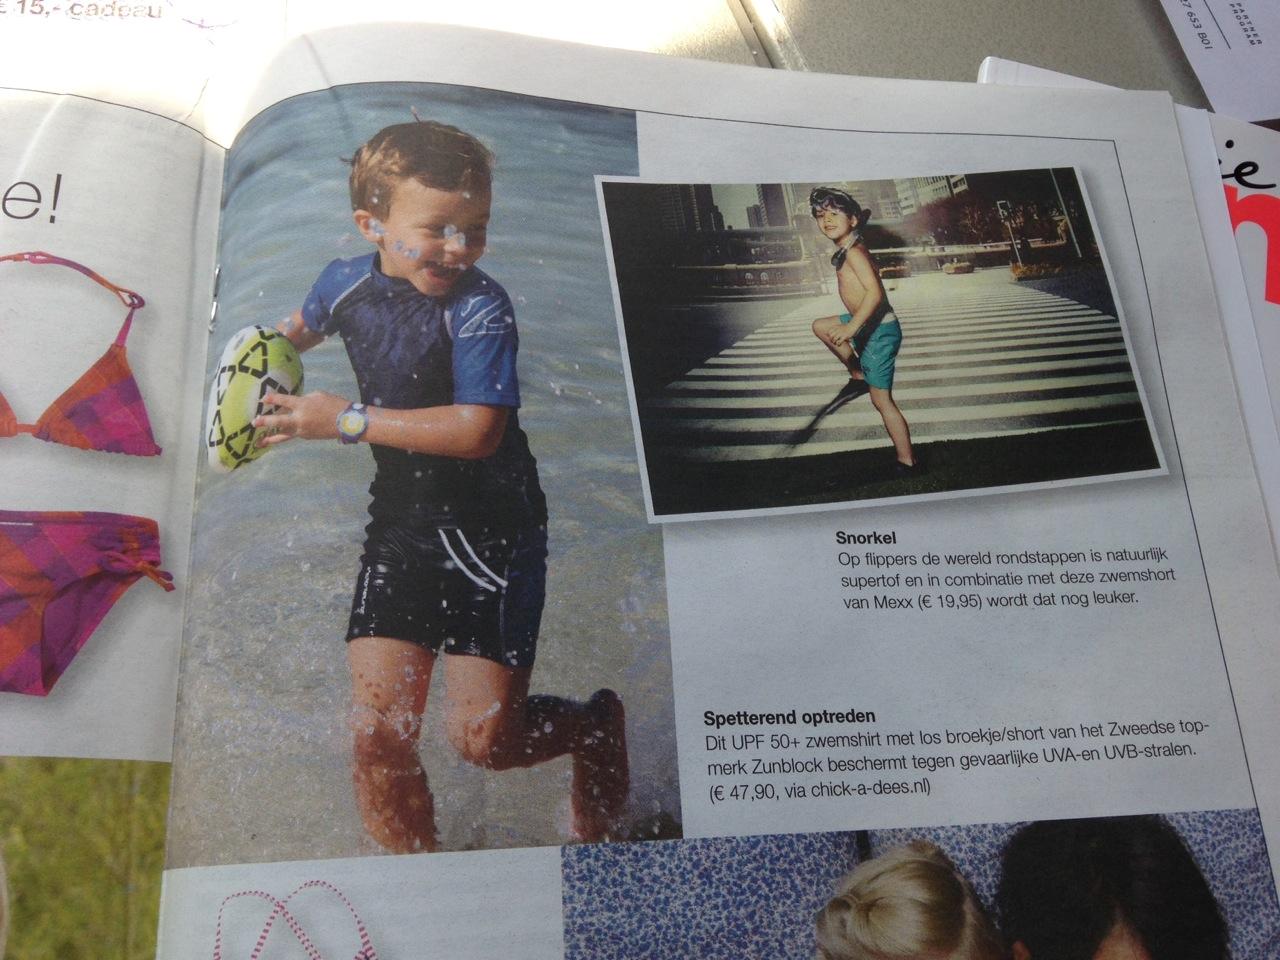 Artikel Anoniem mei 2013 uv zwemkleding